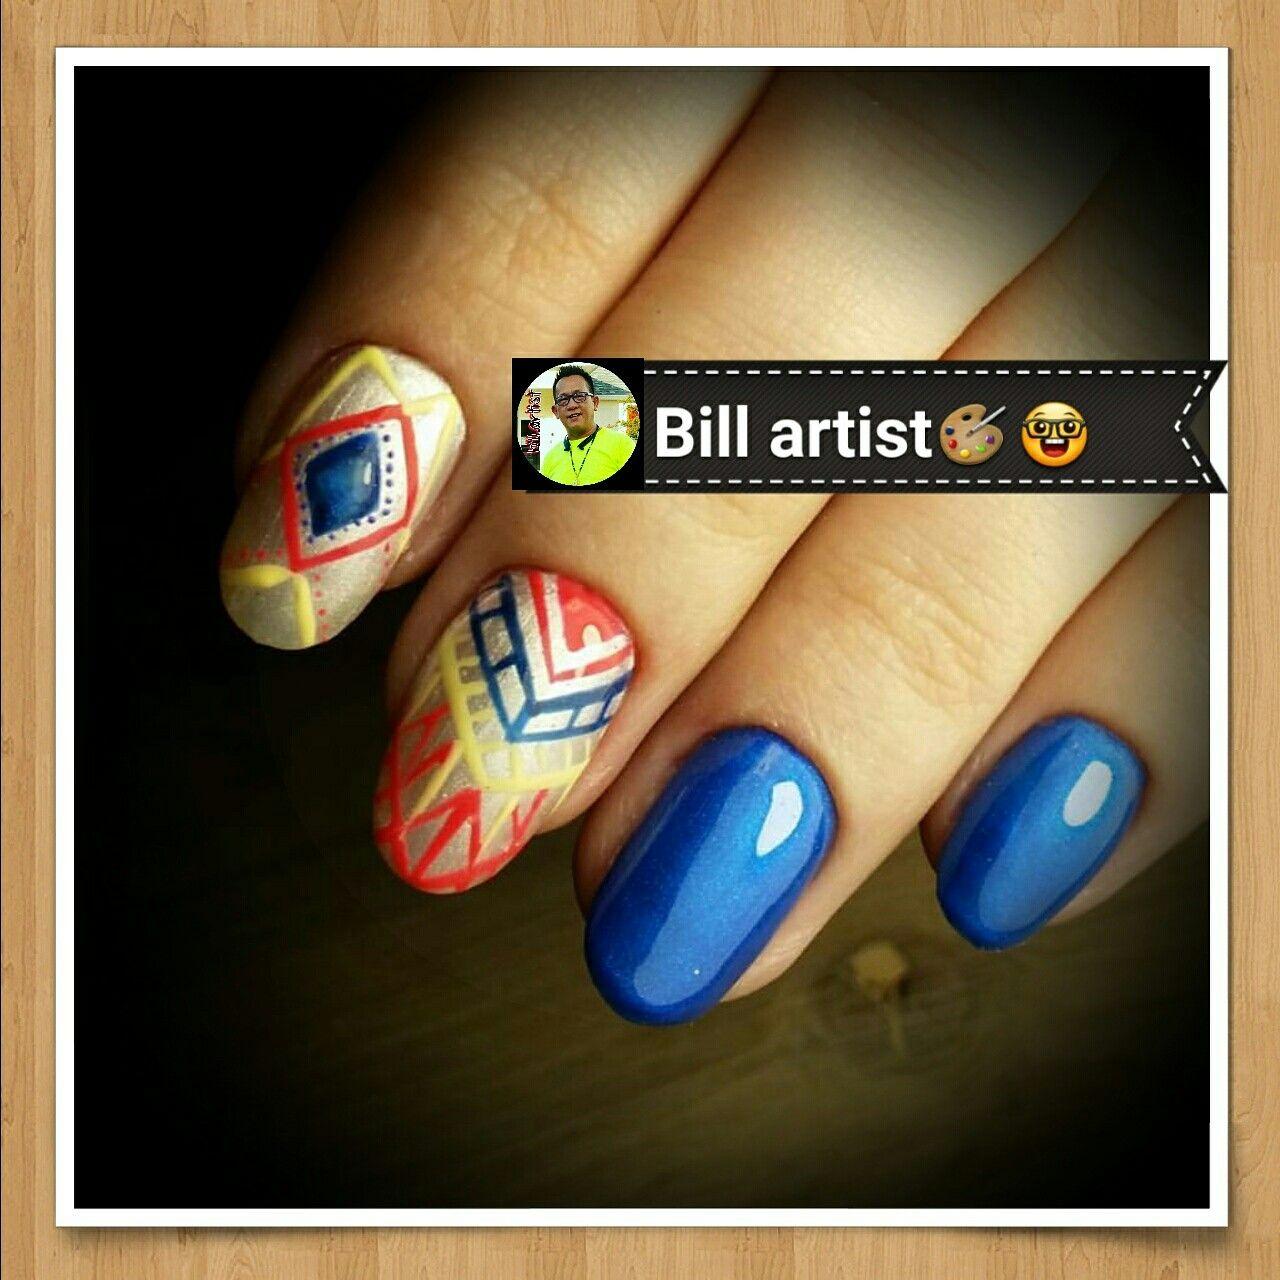 #nailsartist#billartist#boutique#bill_cali###